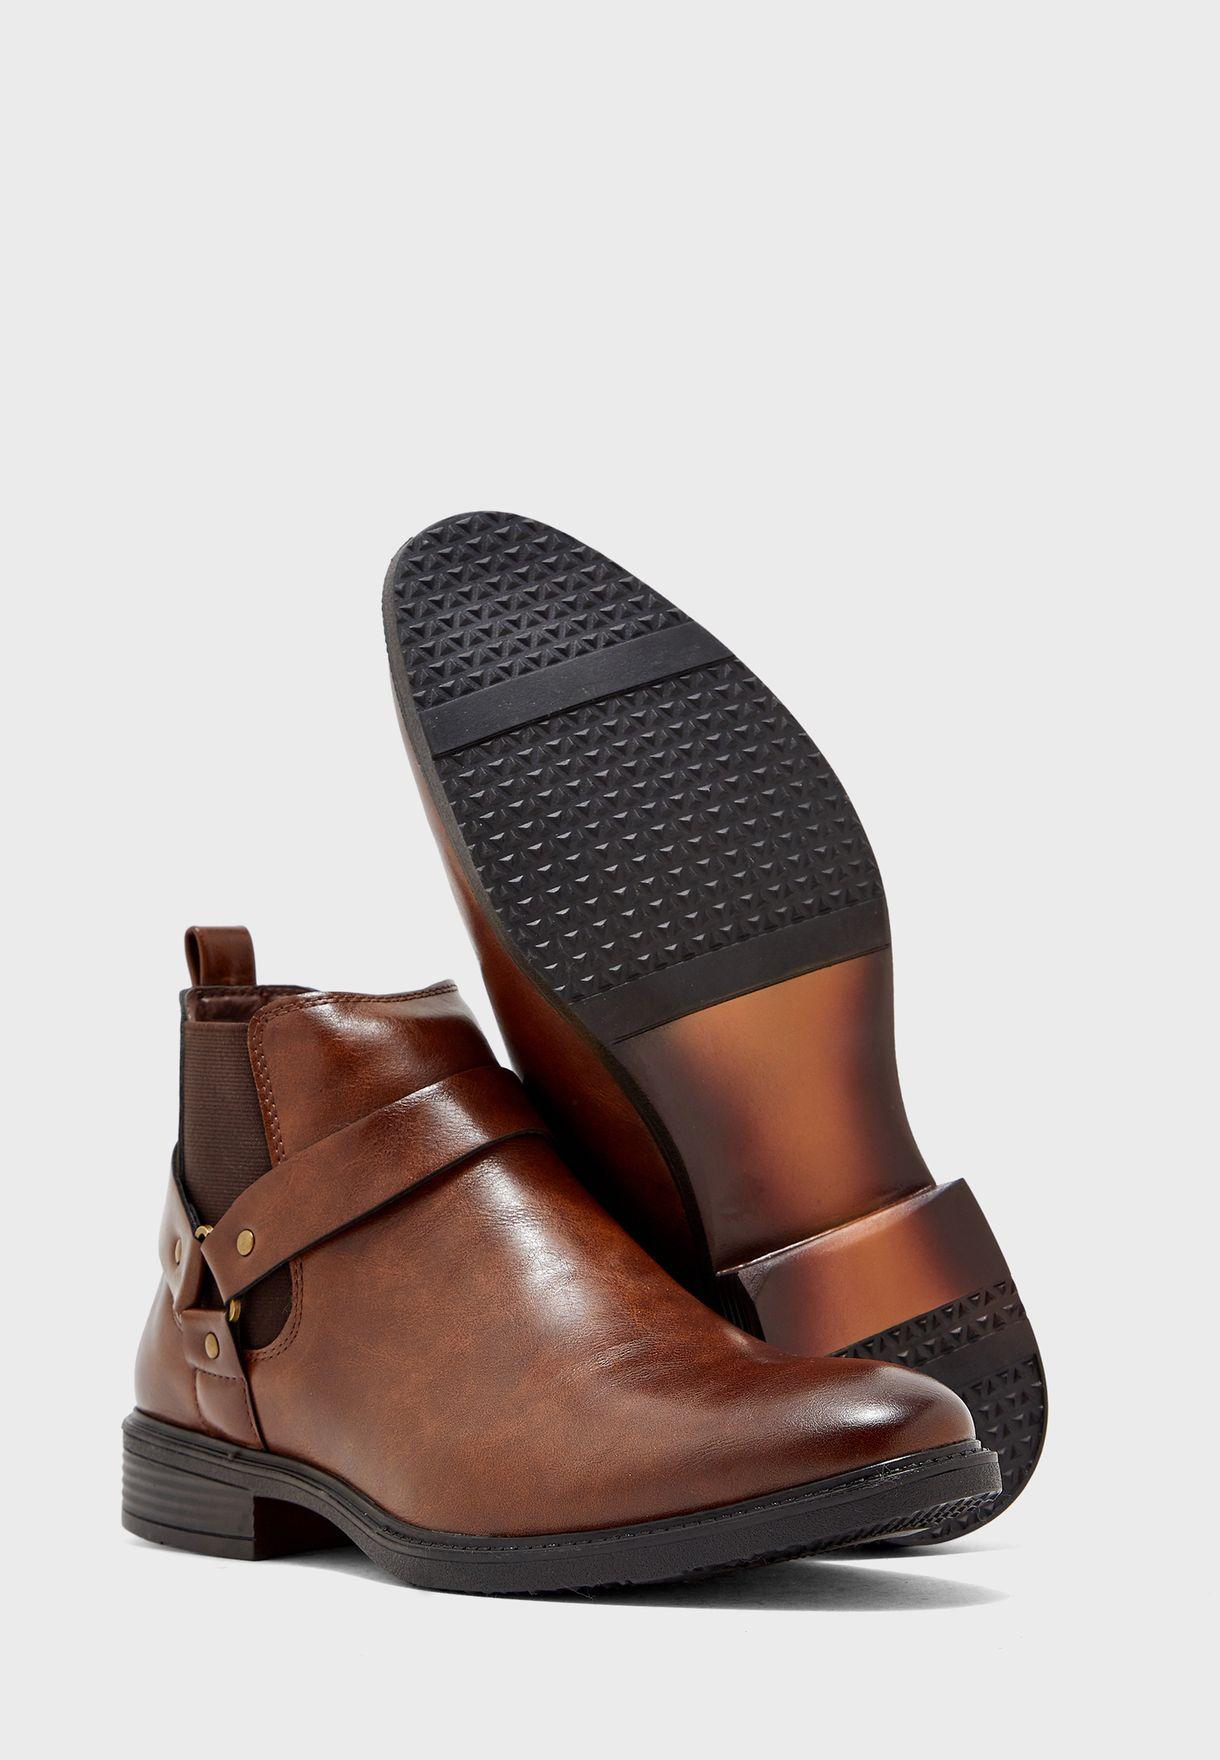 Gradient Buckle Strap Chelsea Boots